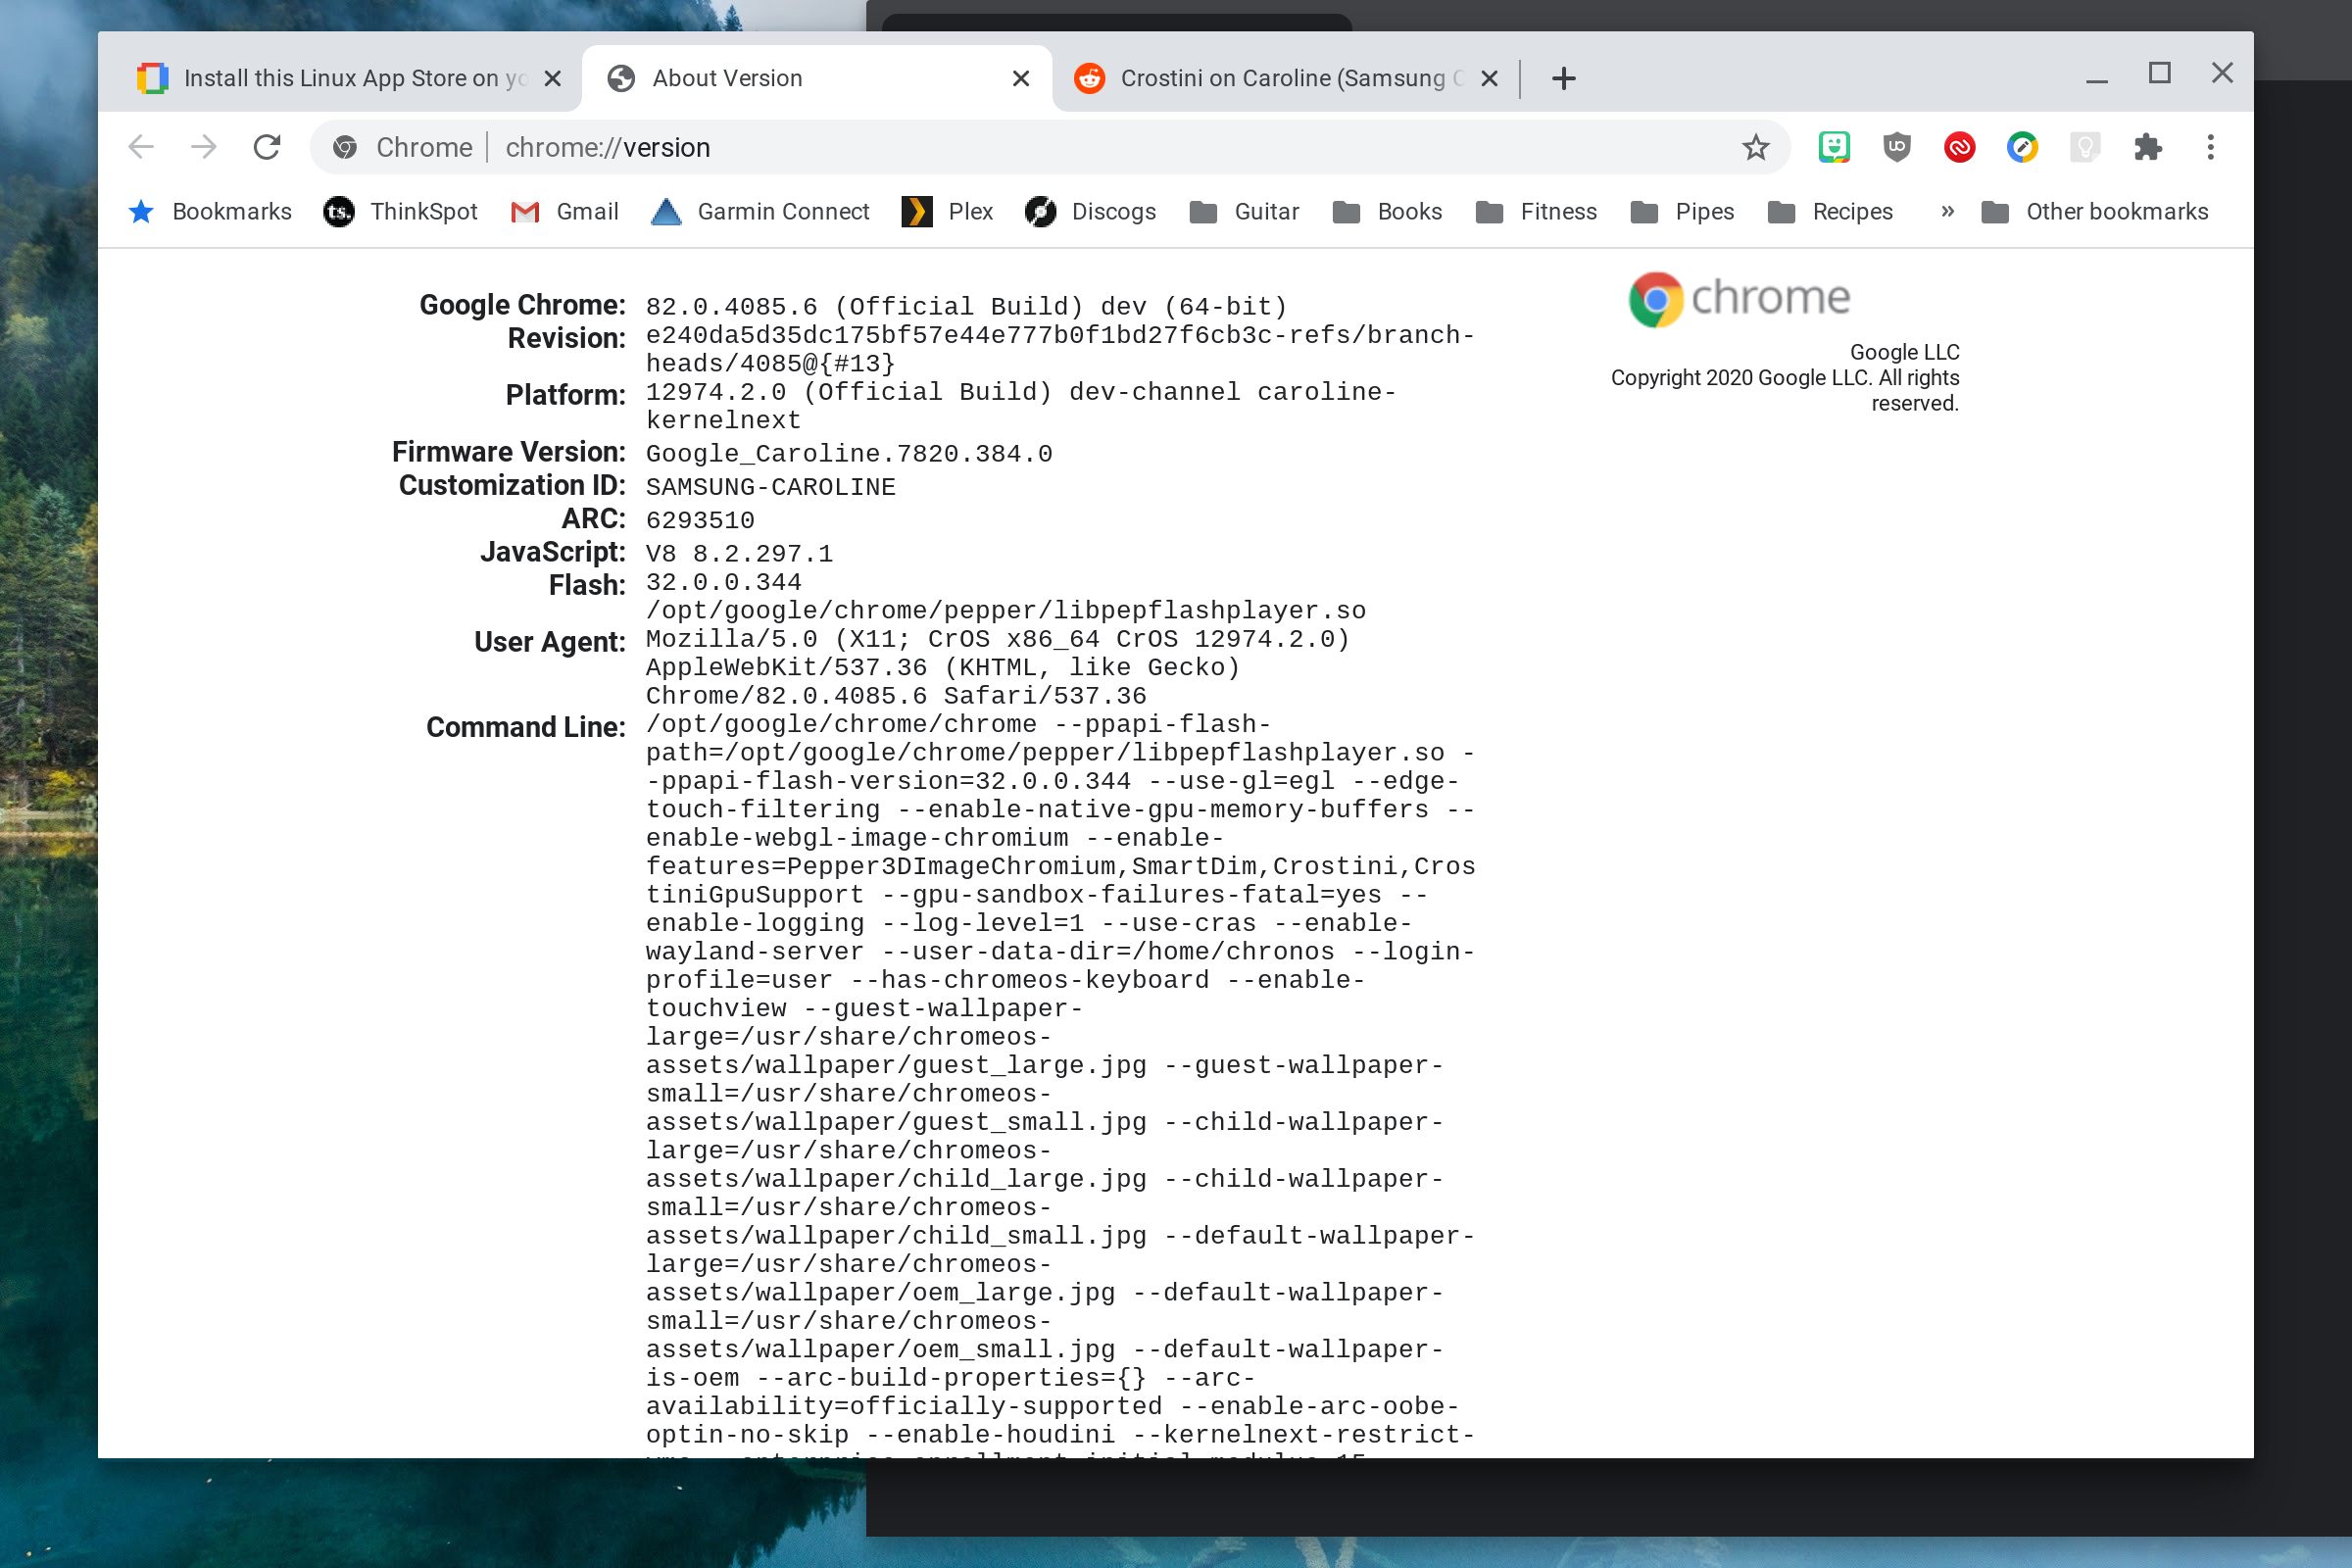 Samsung Chromebook Pro Prepares Linux App Support 9to5google